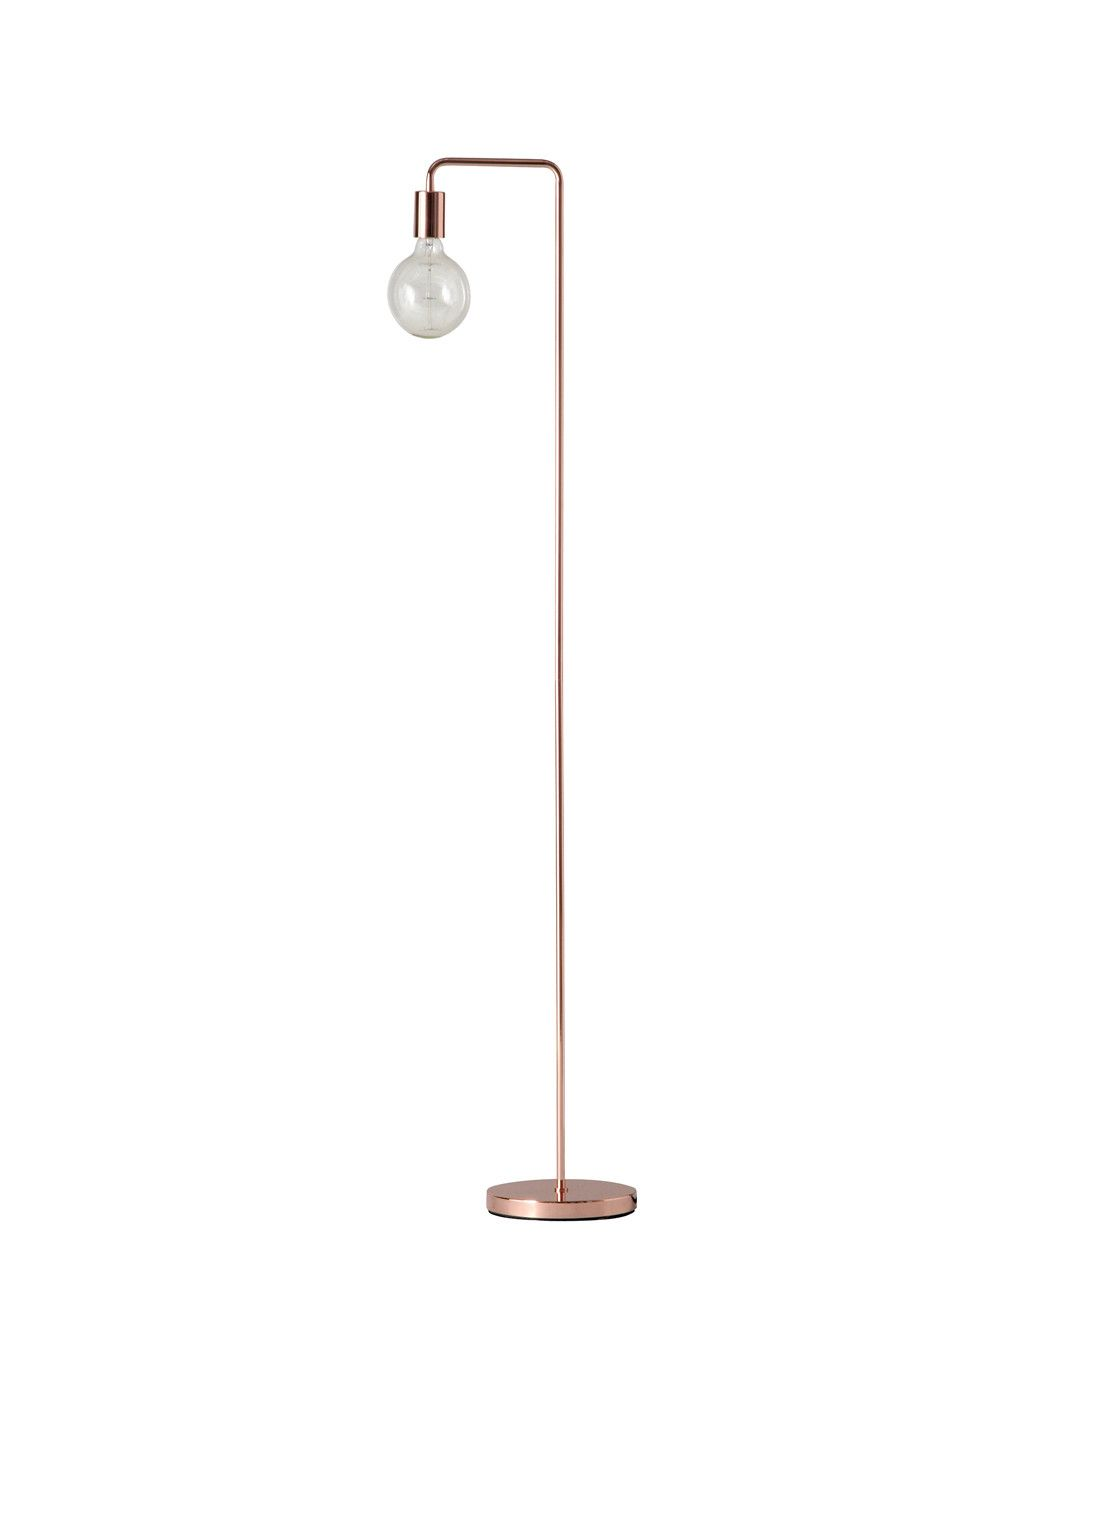 Cool Vloerlamp Vloerlamp Verlichting Interieurstyling